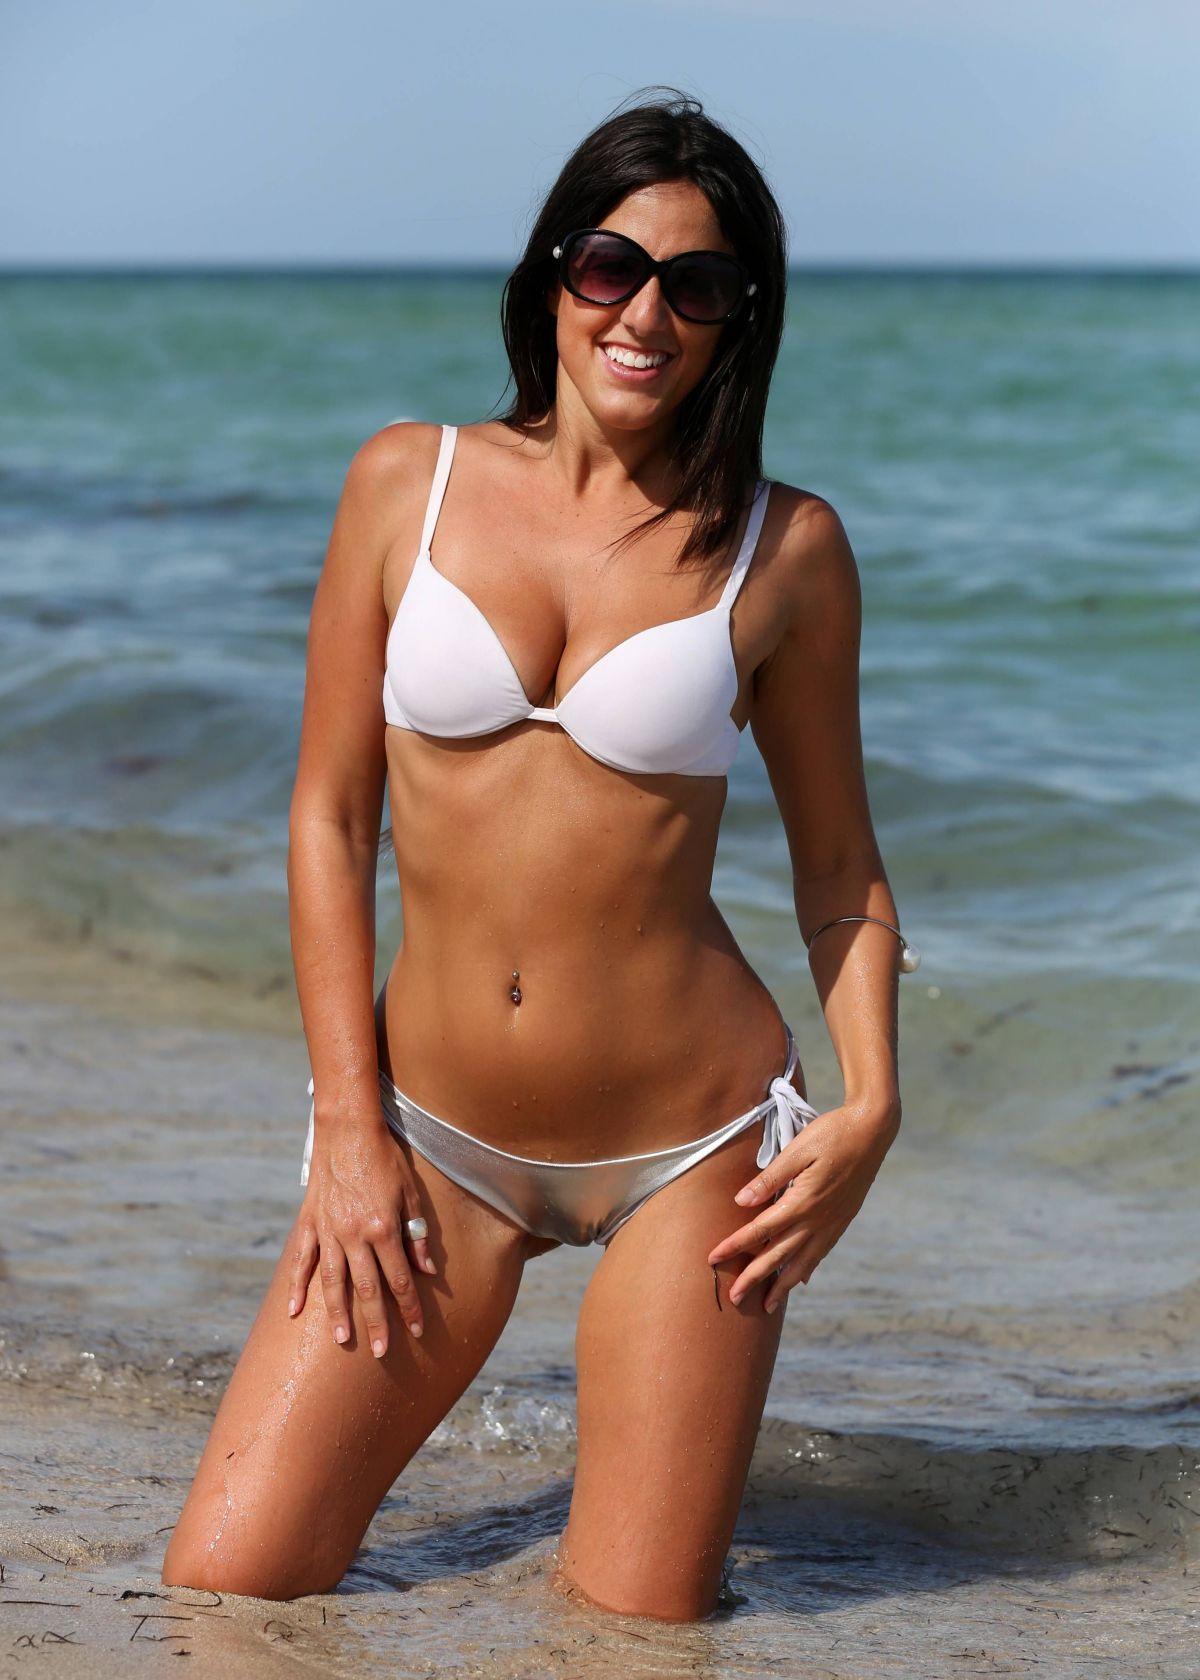 Naked female models widescreen